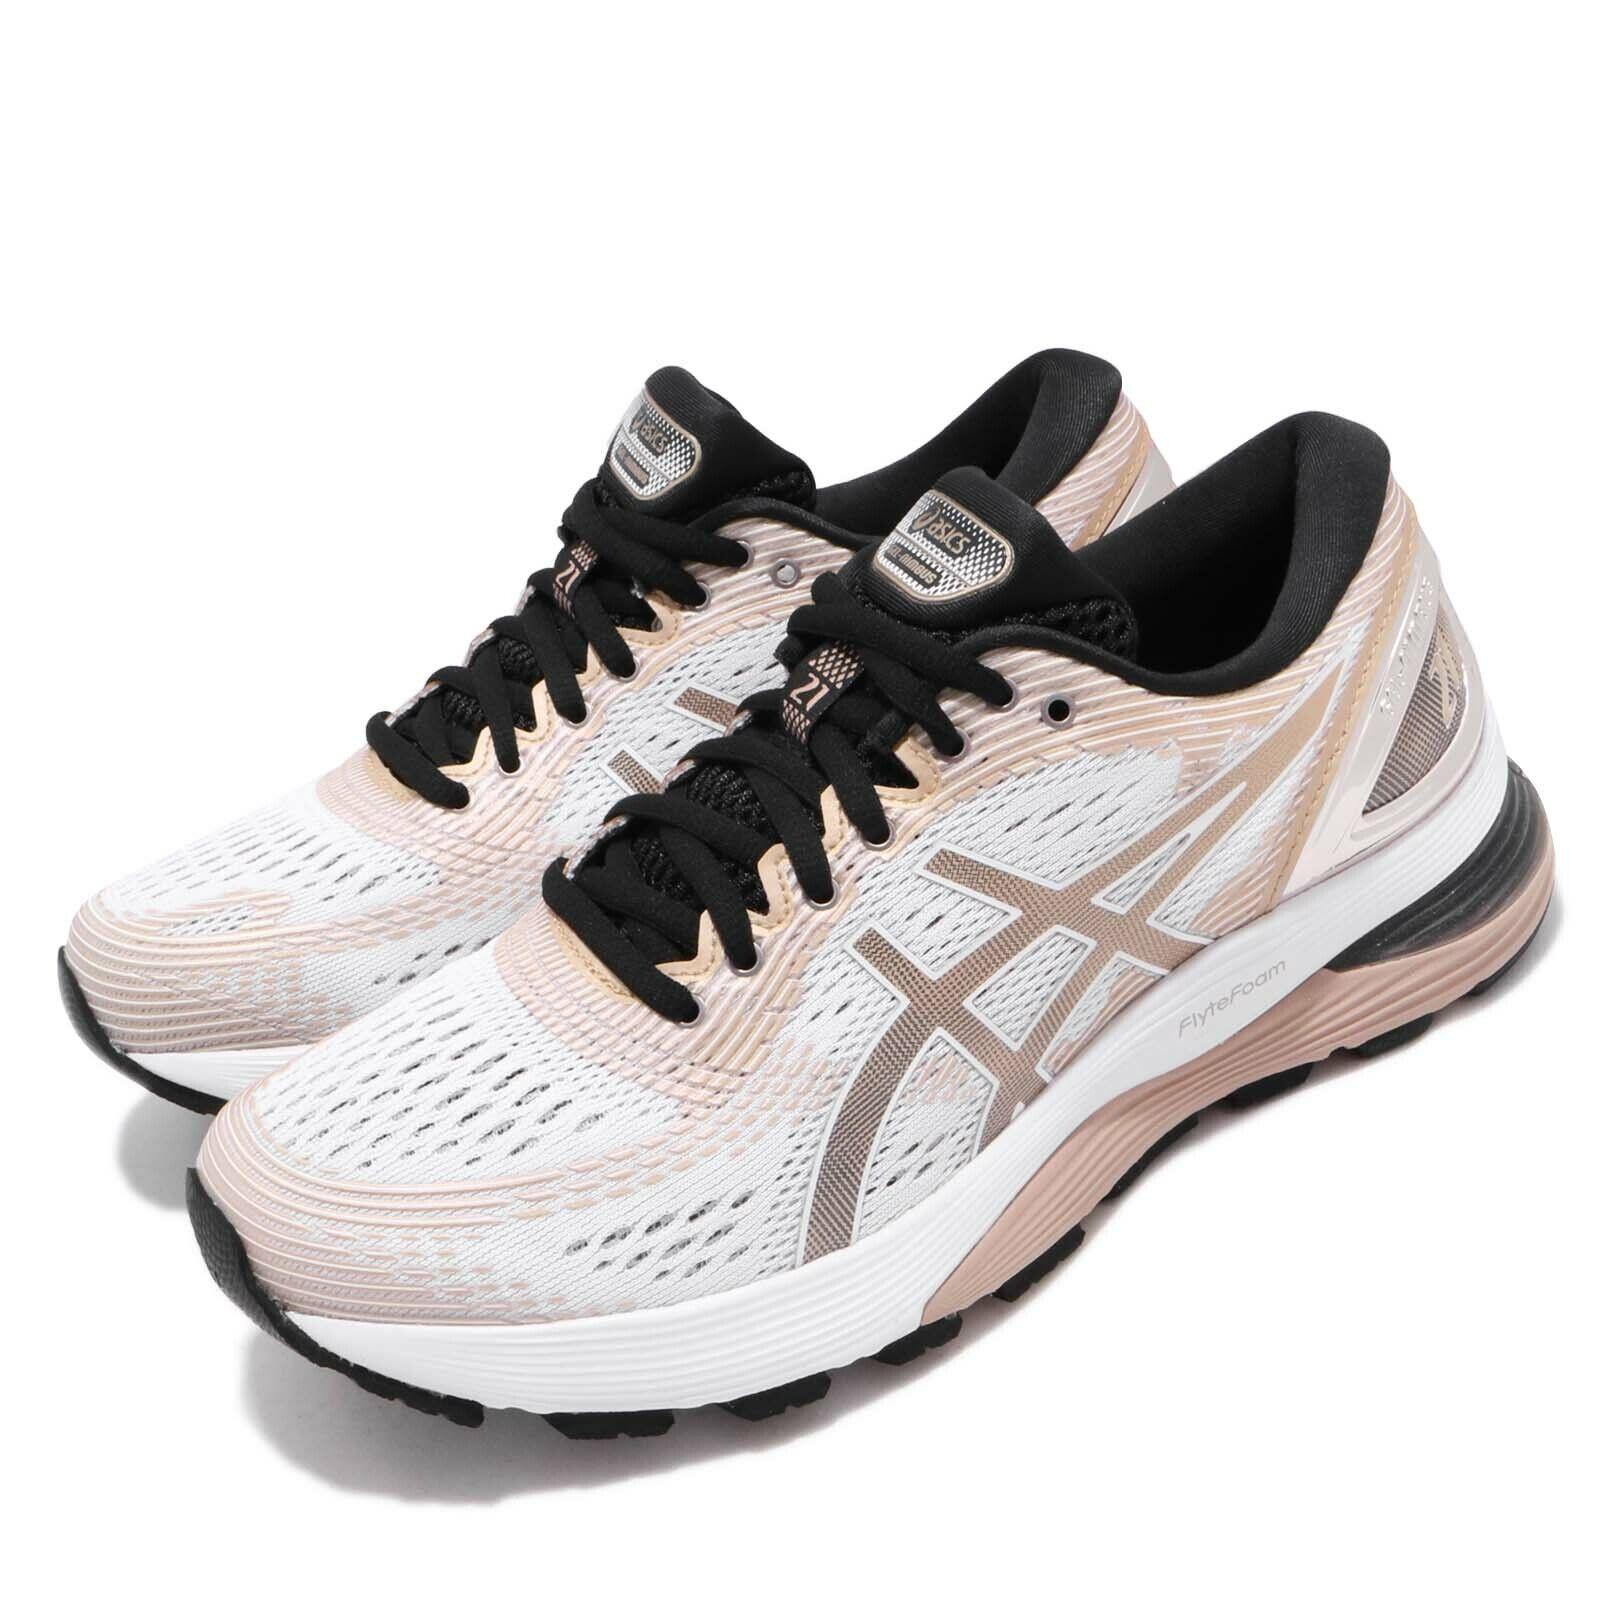 Asics Gel-Nimbus 21 Platino blancoo Hielo Almendra Zapatos para mujer run 1012A608-100